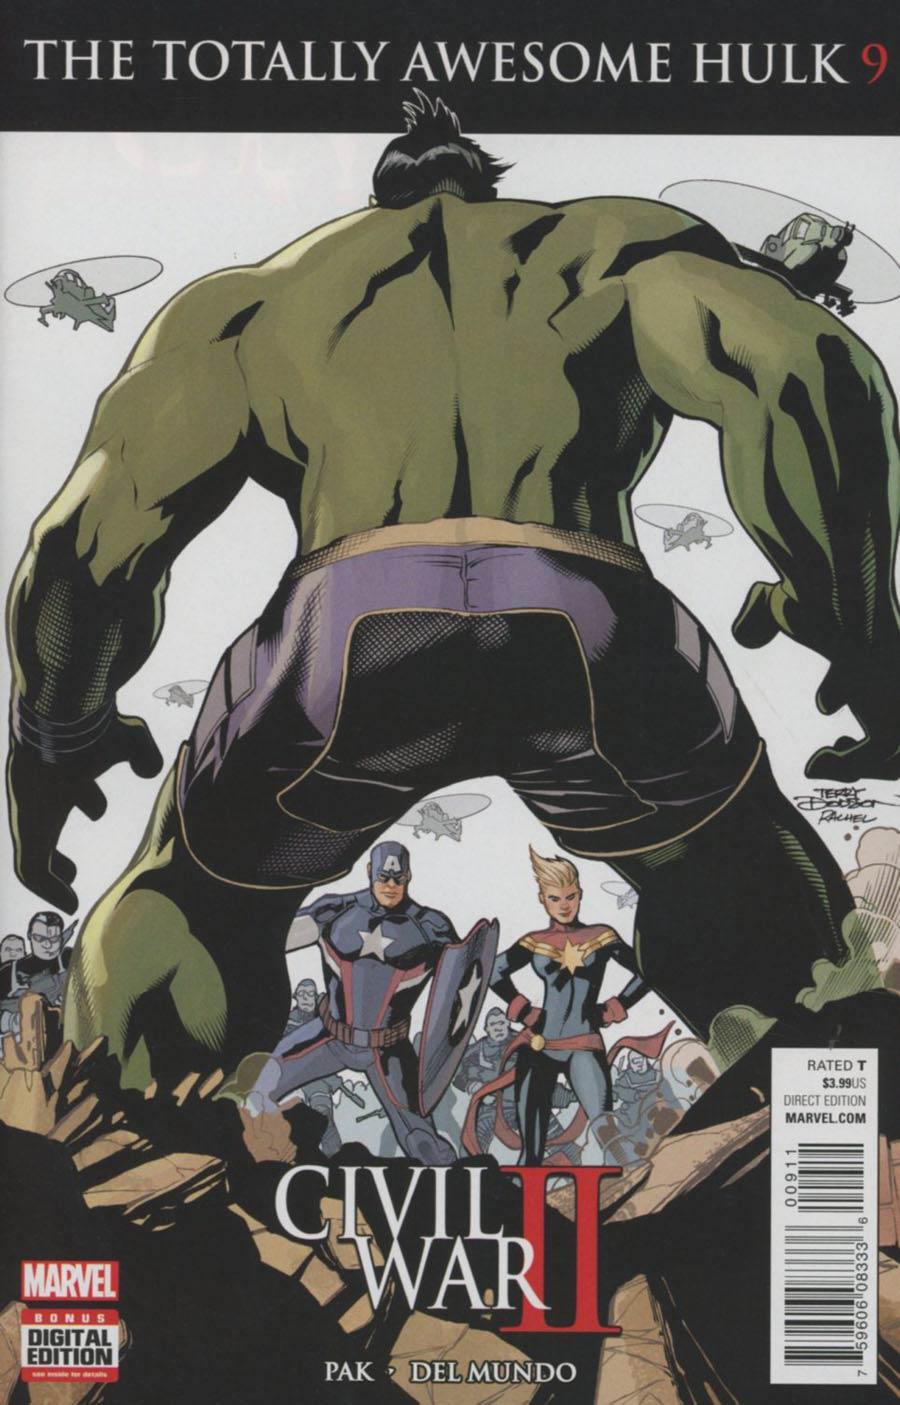 Totally Awesome Hulk #9 (Civil War II Tie-In)